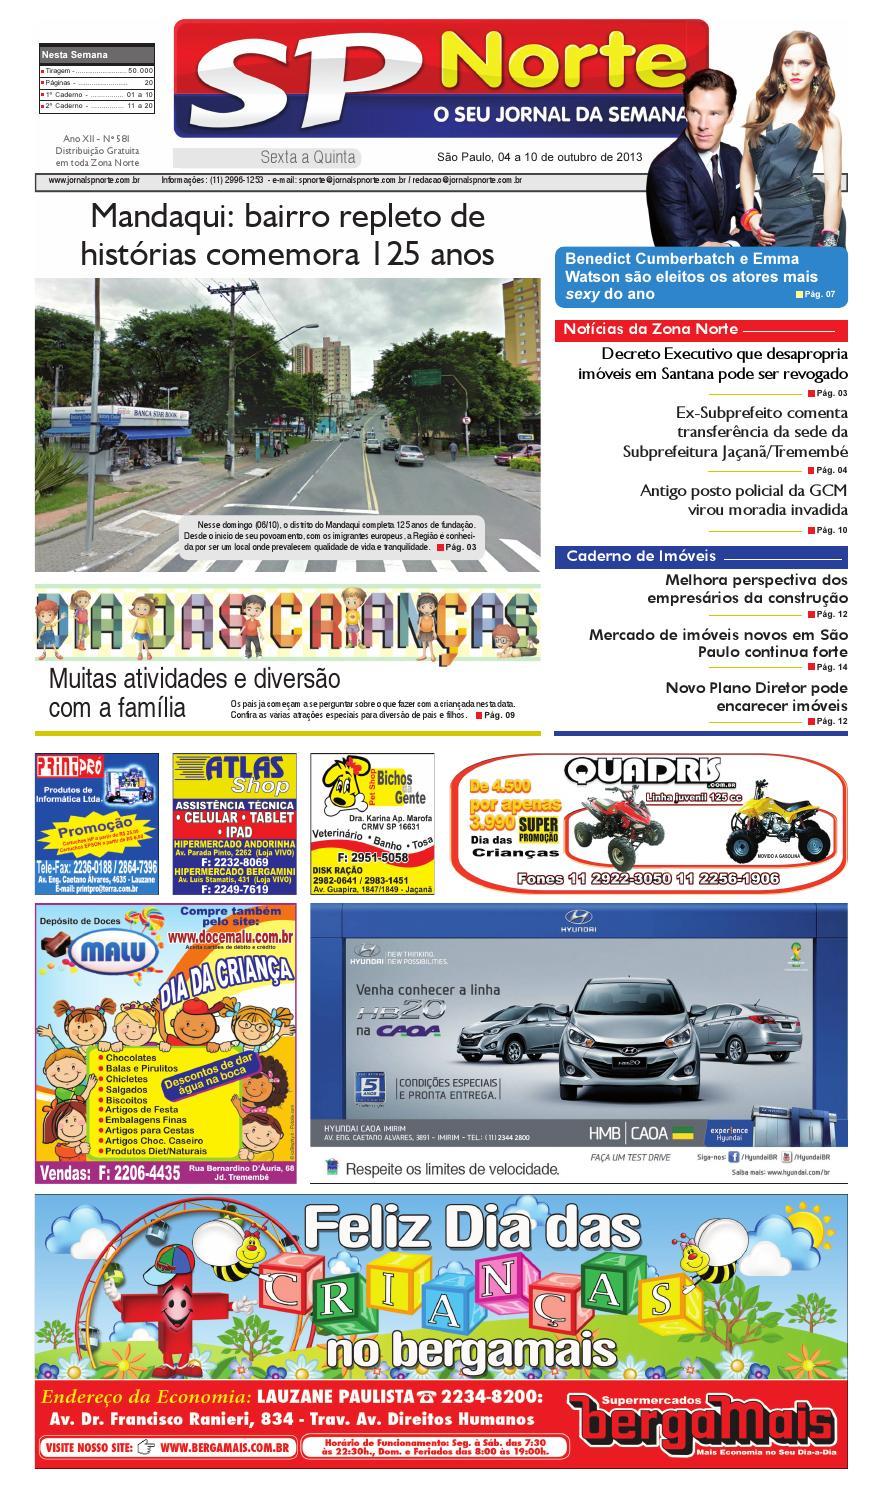 8f8f280a77dfc Jornal SP Norte 581 by Grupo SP de jornais - issuu